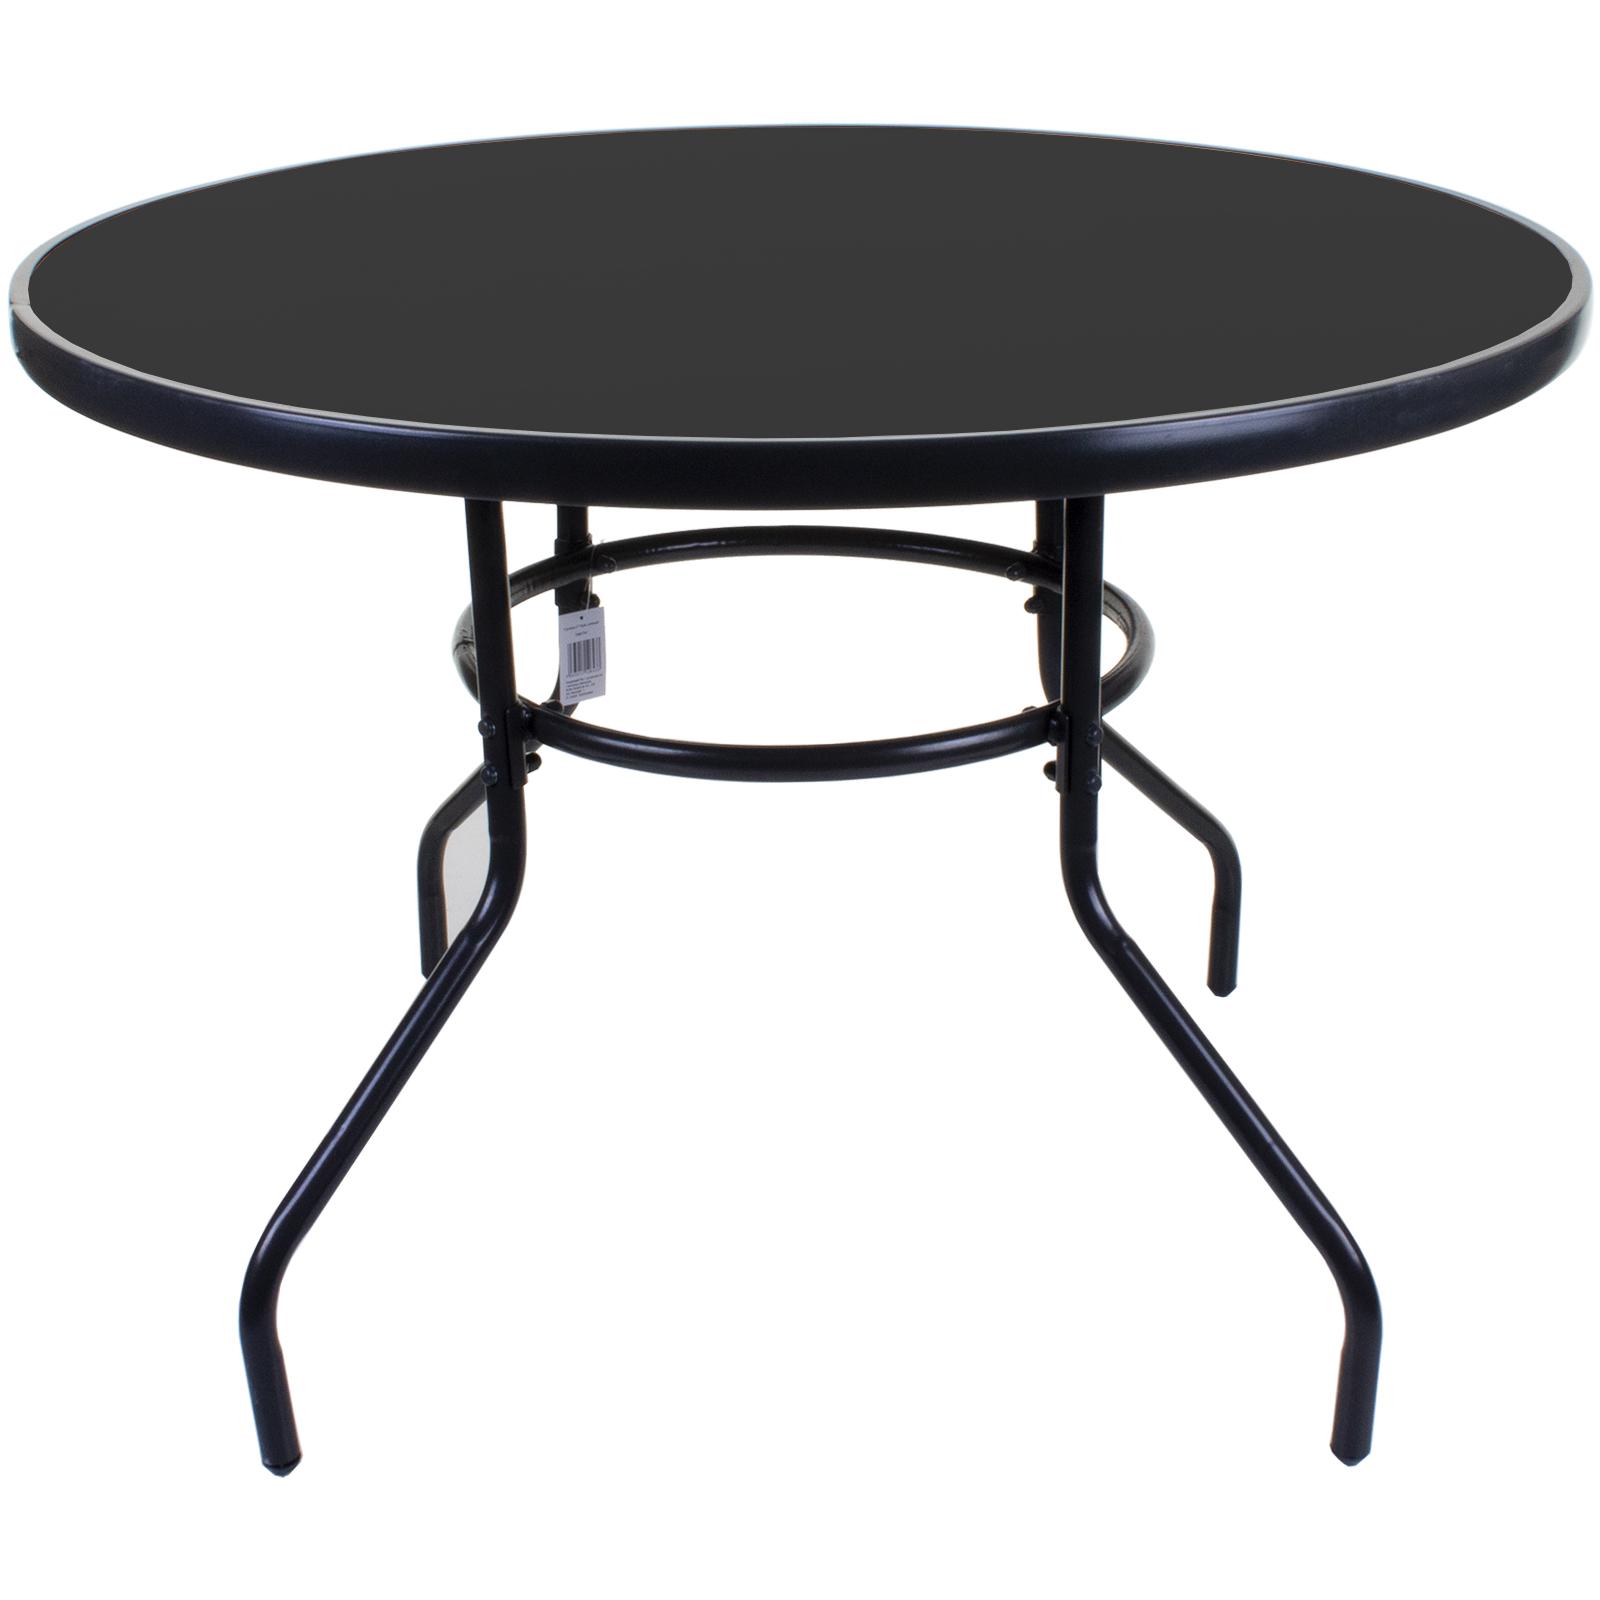 100cm round glass table black metal